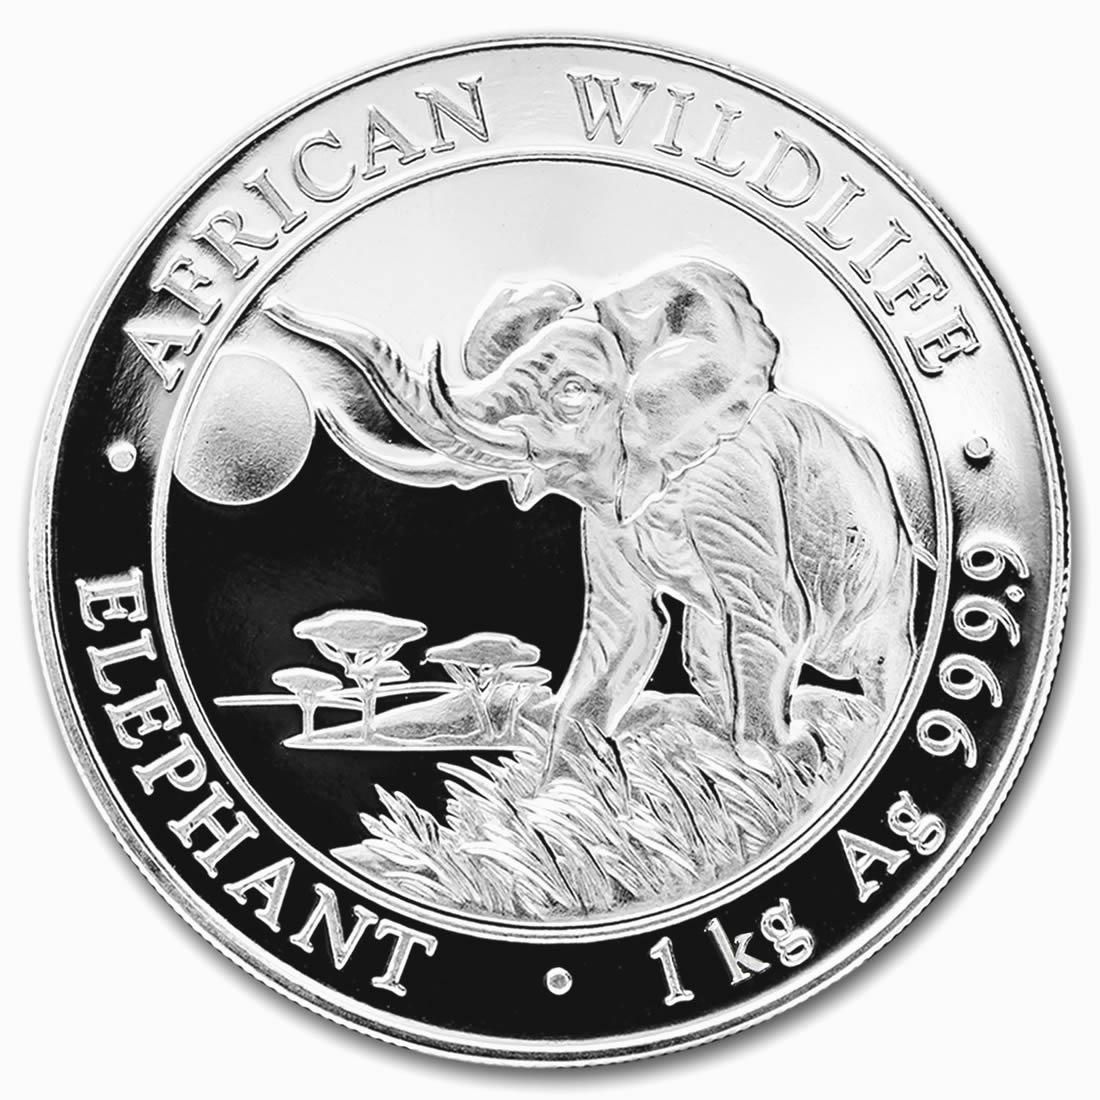 2016 Somalia 1 Kilo Silver Elephant Coin